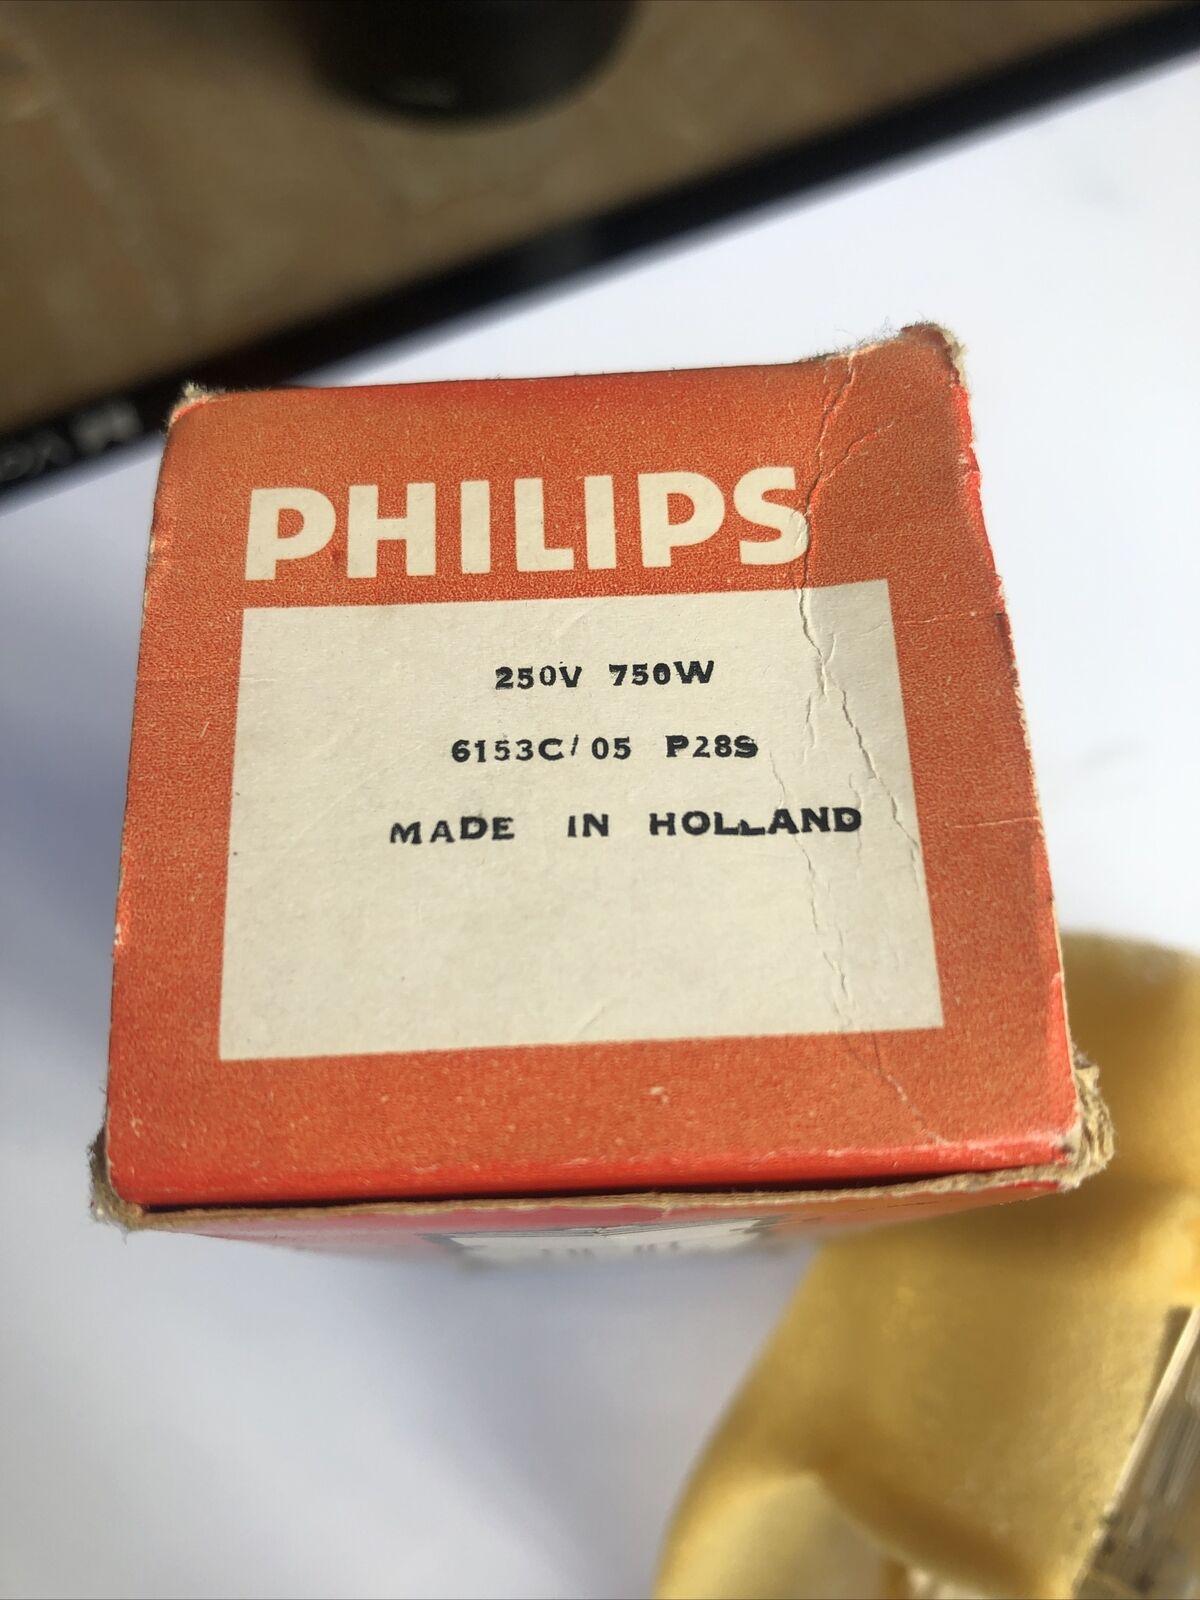 Philips 6153c/05 250v 750w P28s Bulb Lamp Globe